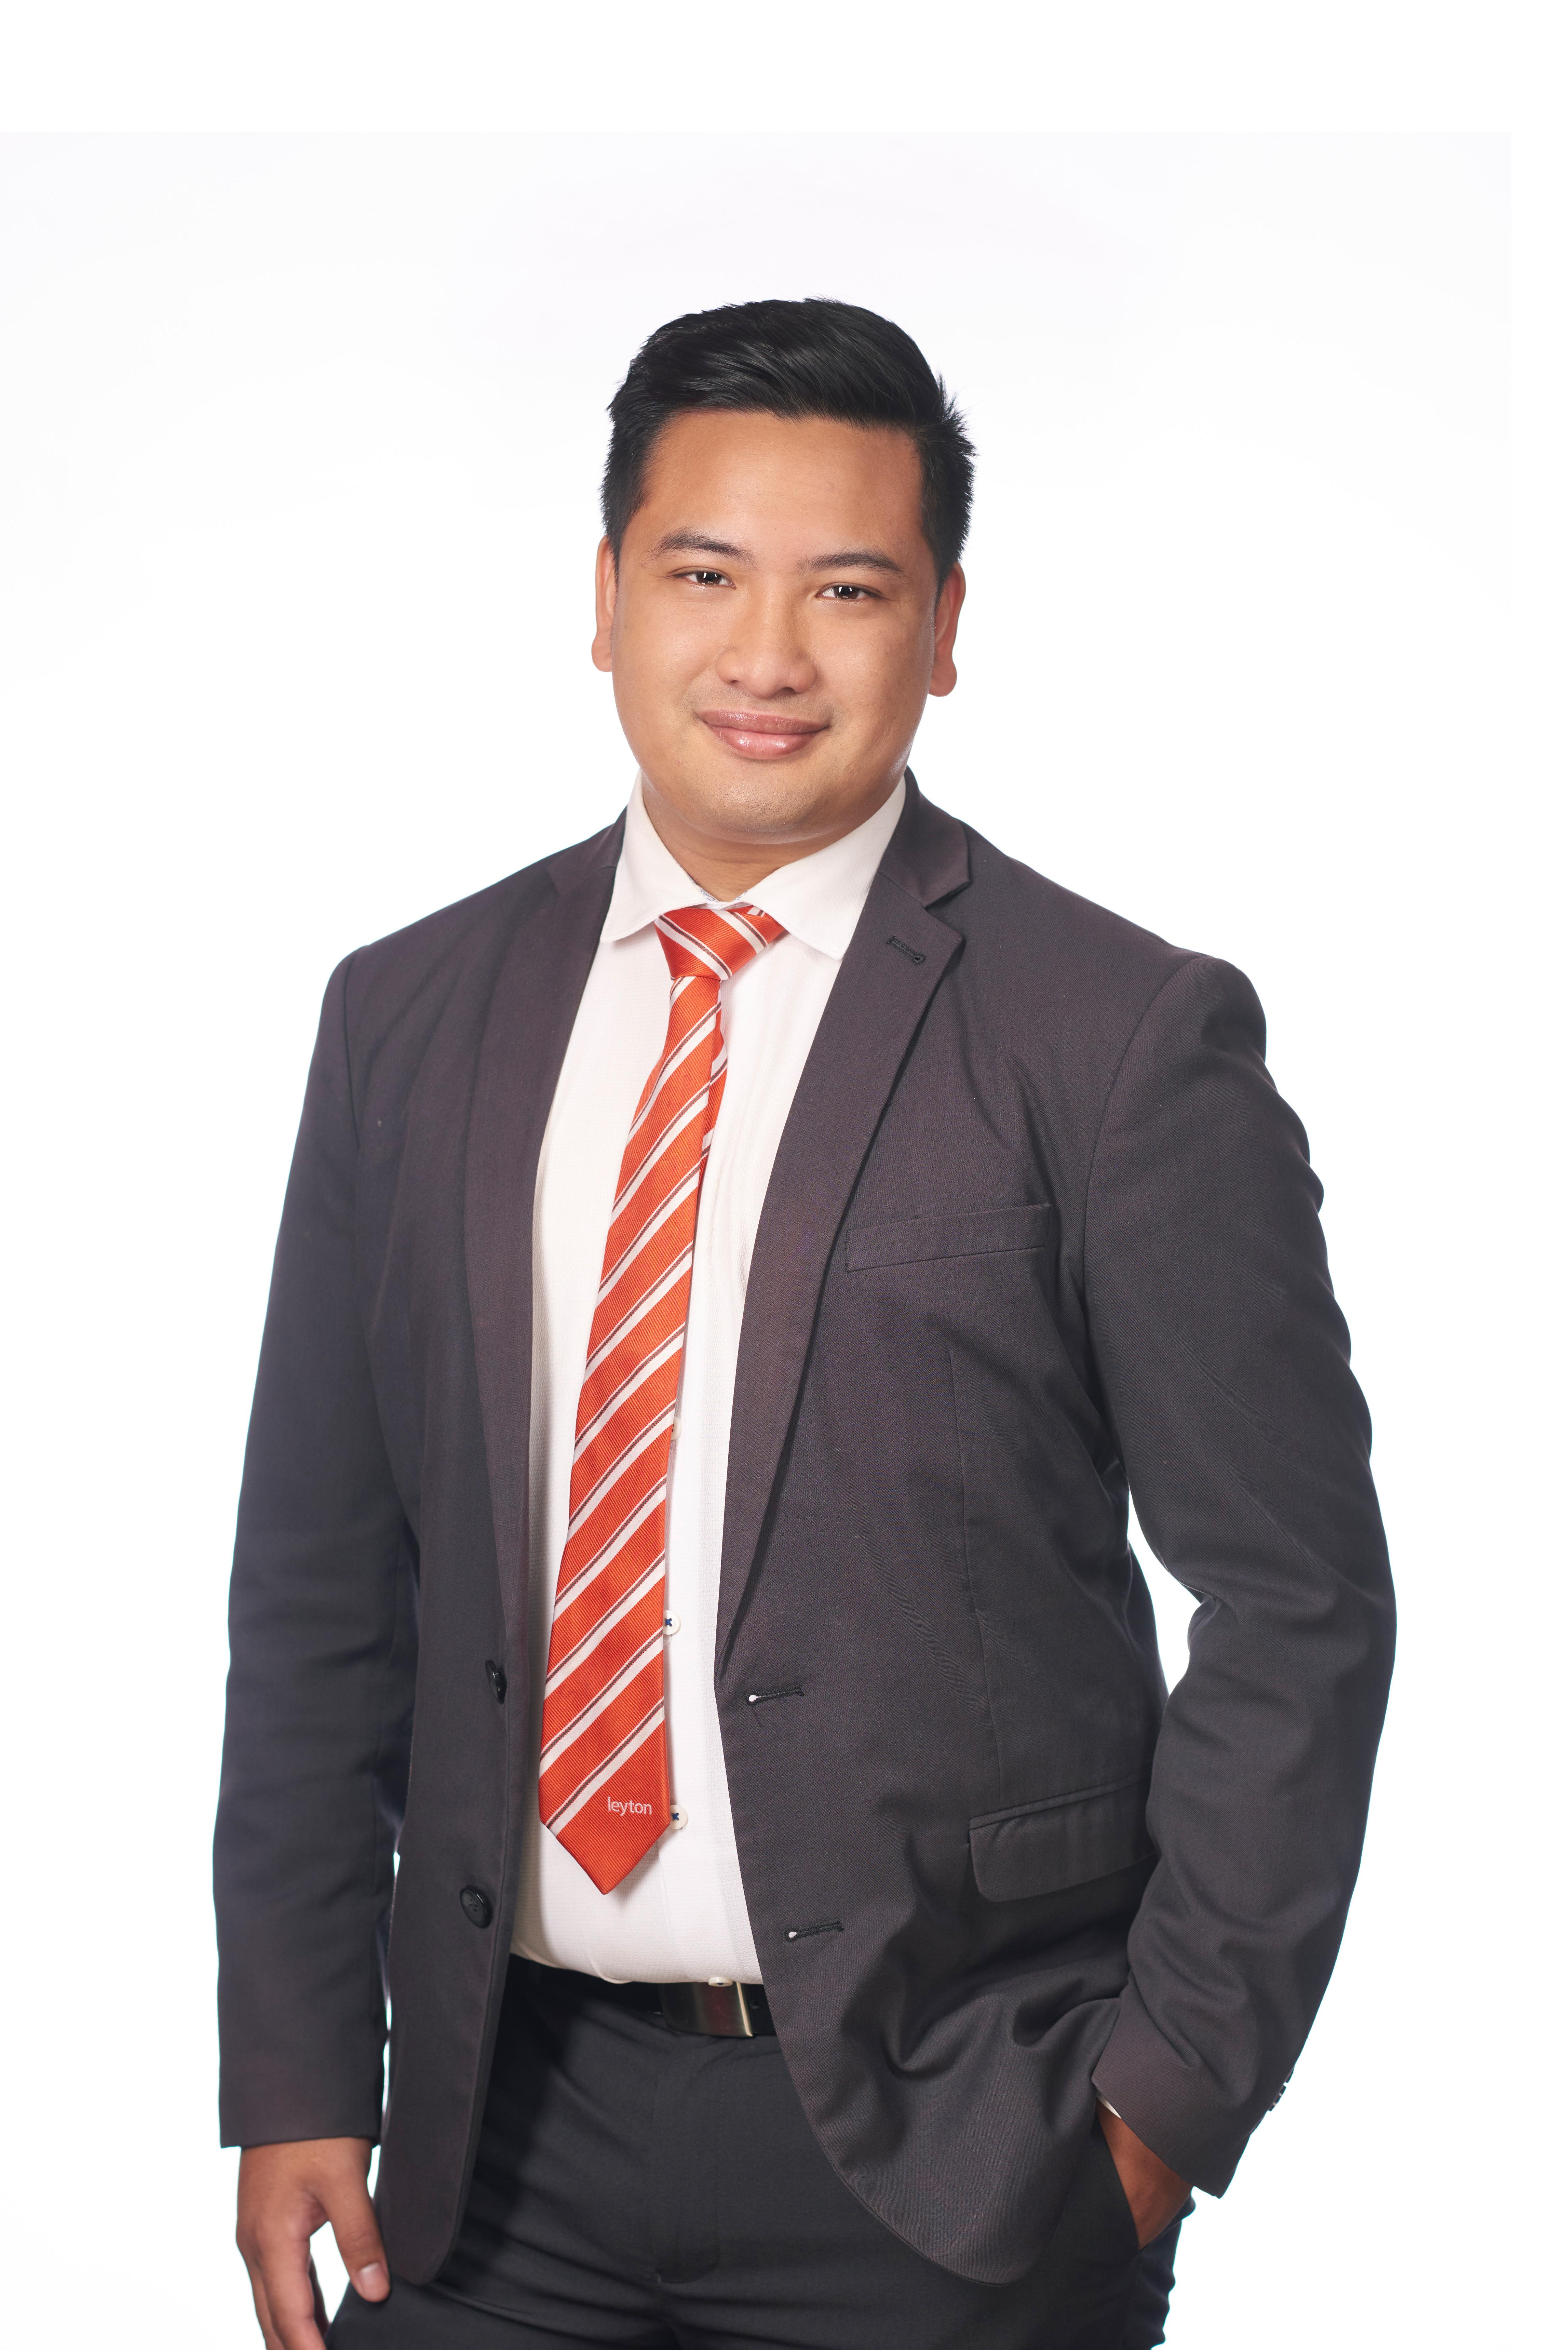 Andrew Chhang